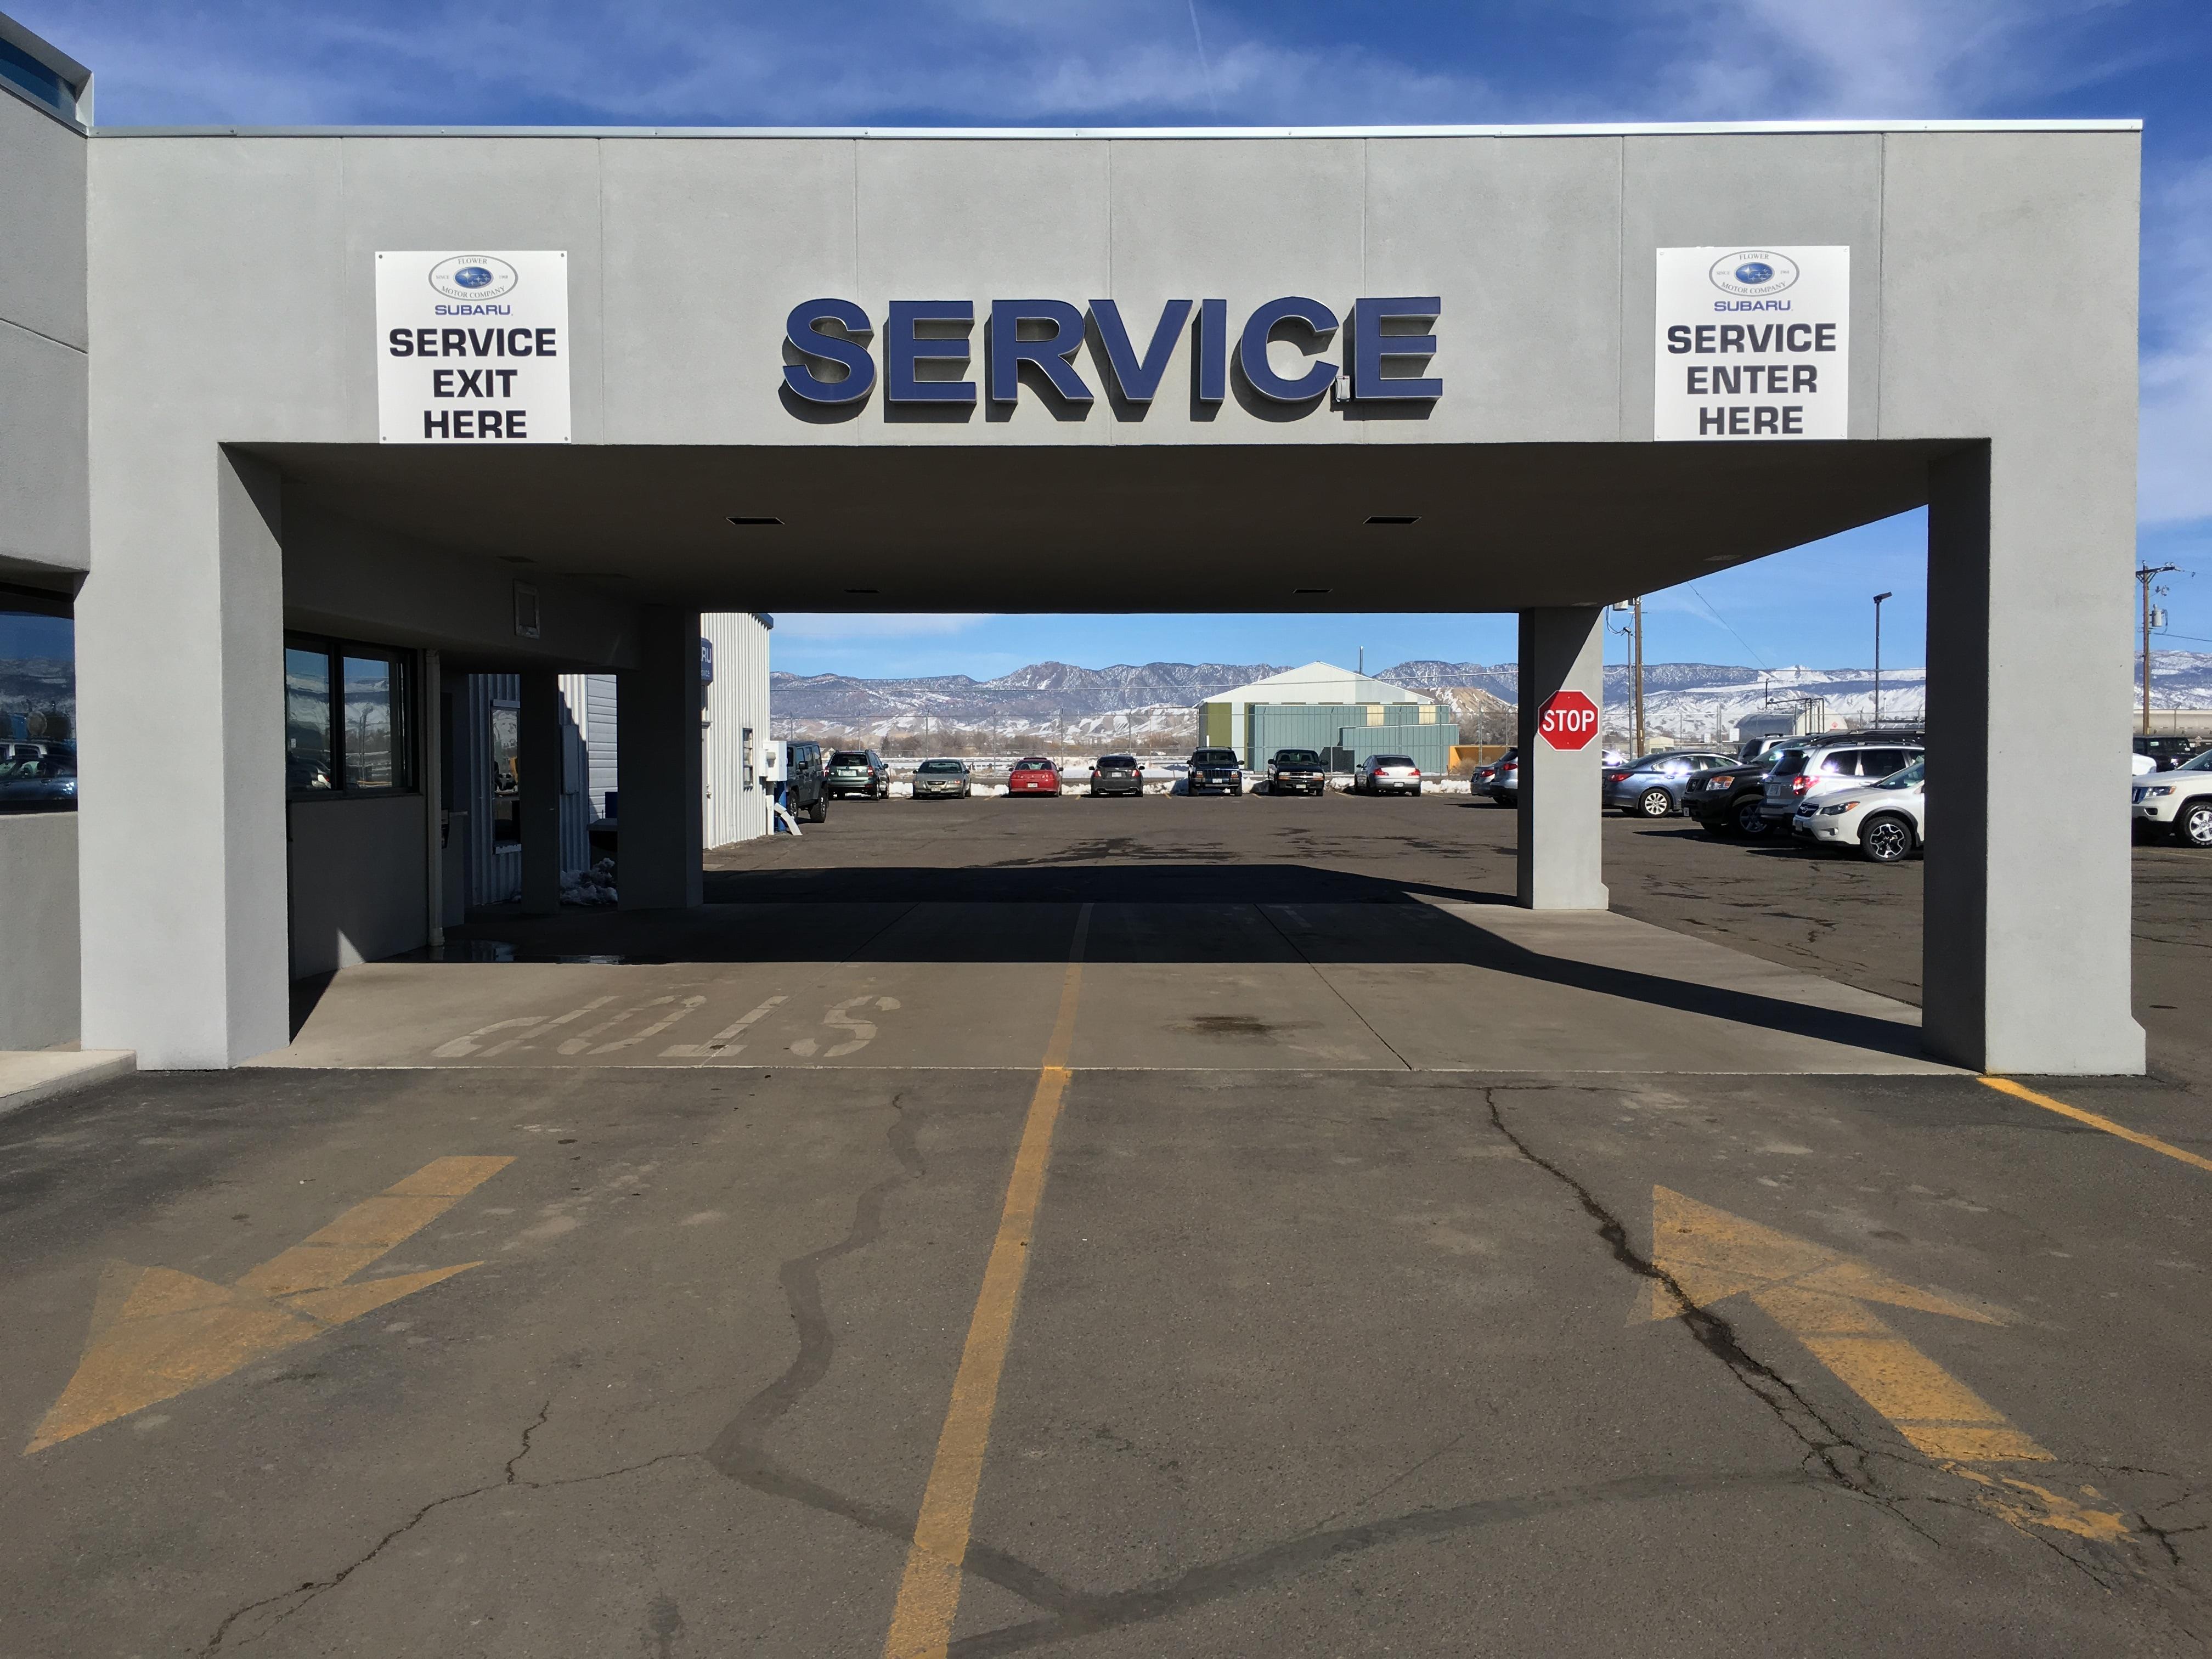 Montrose subaru service car repair car service near for Flower motor company montrose co 81401